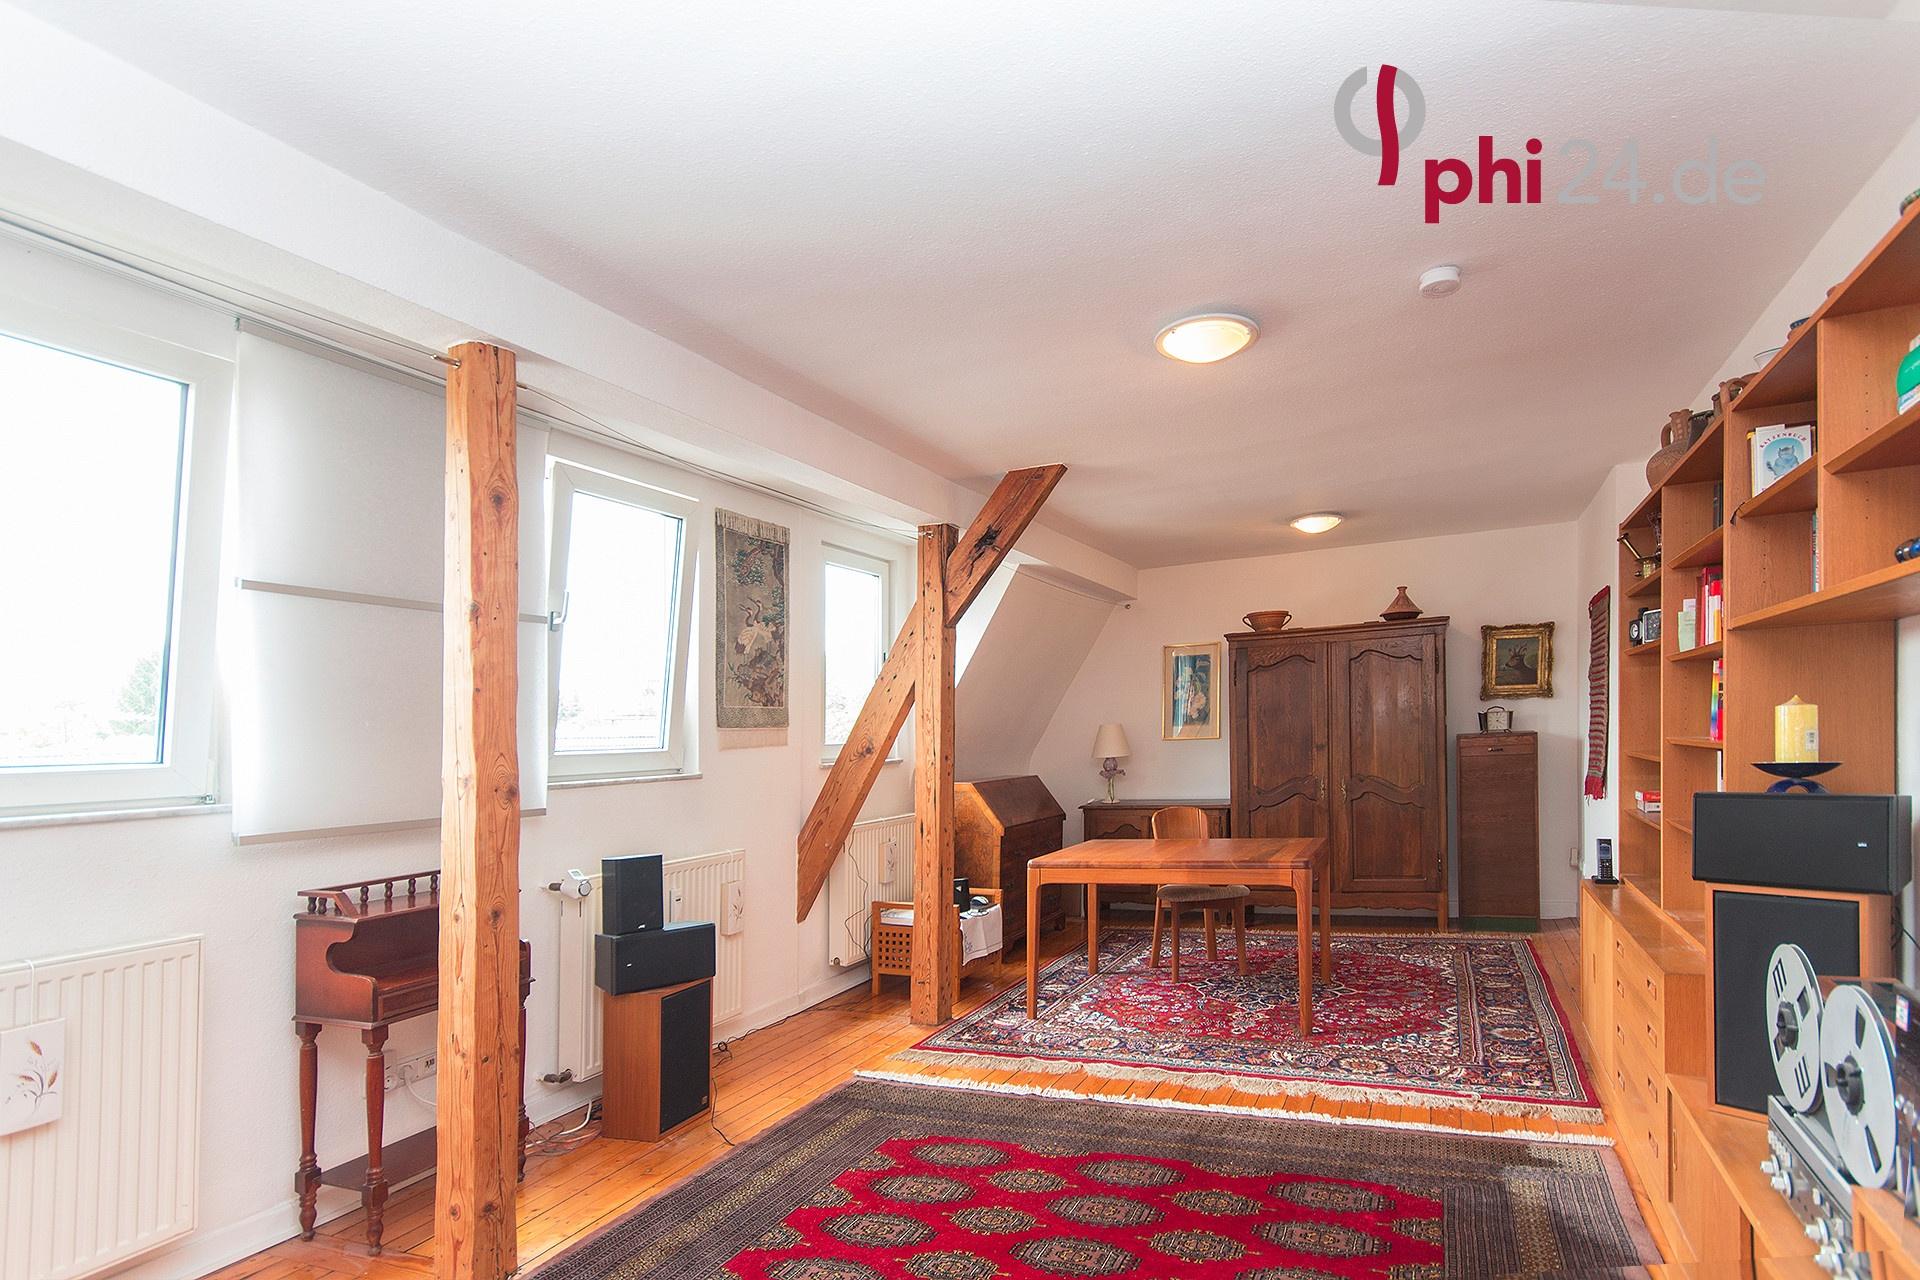 phi aachen ger umige 2 raum dach maisonette mit weitblick in aachen city immobilienmakler. Black Bedroom Furniture Sets. Home Design Ideas